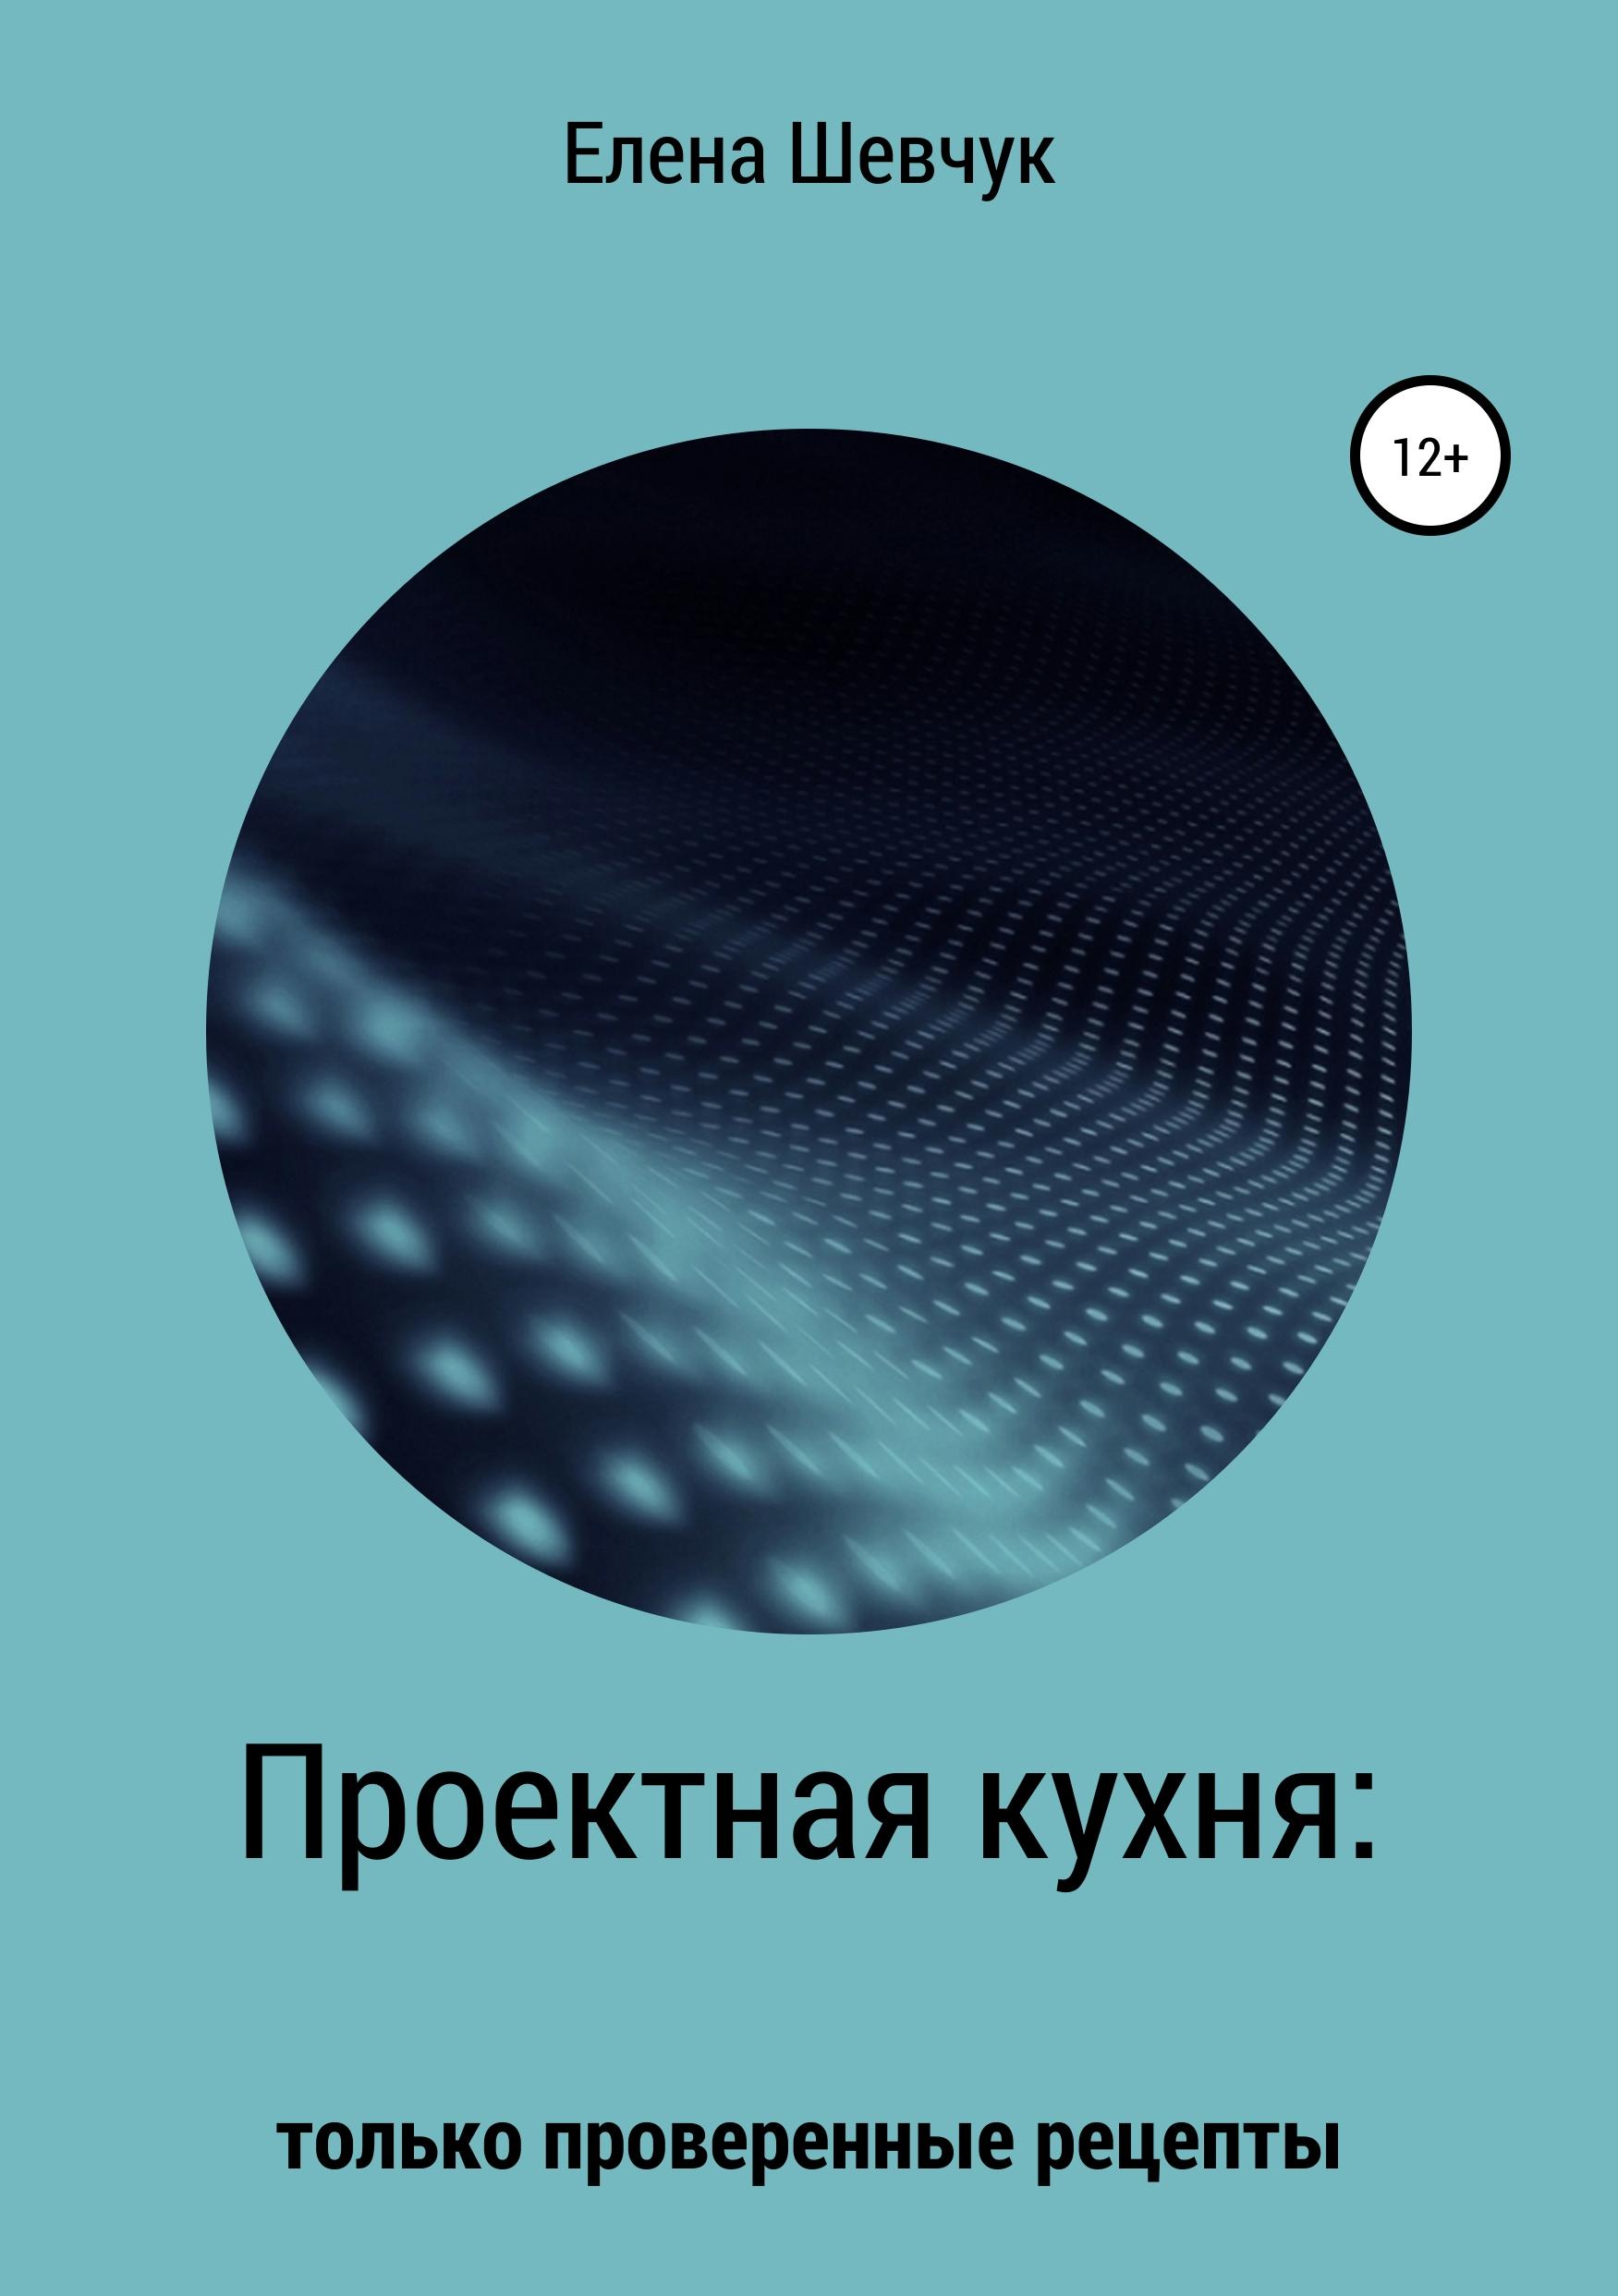 Обложка книги. Автор - Елена Шевчук